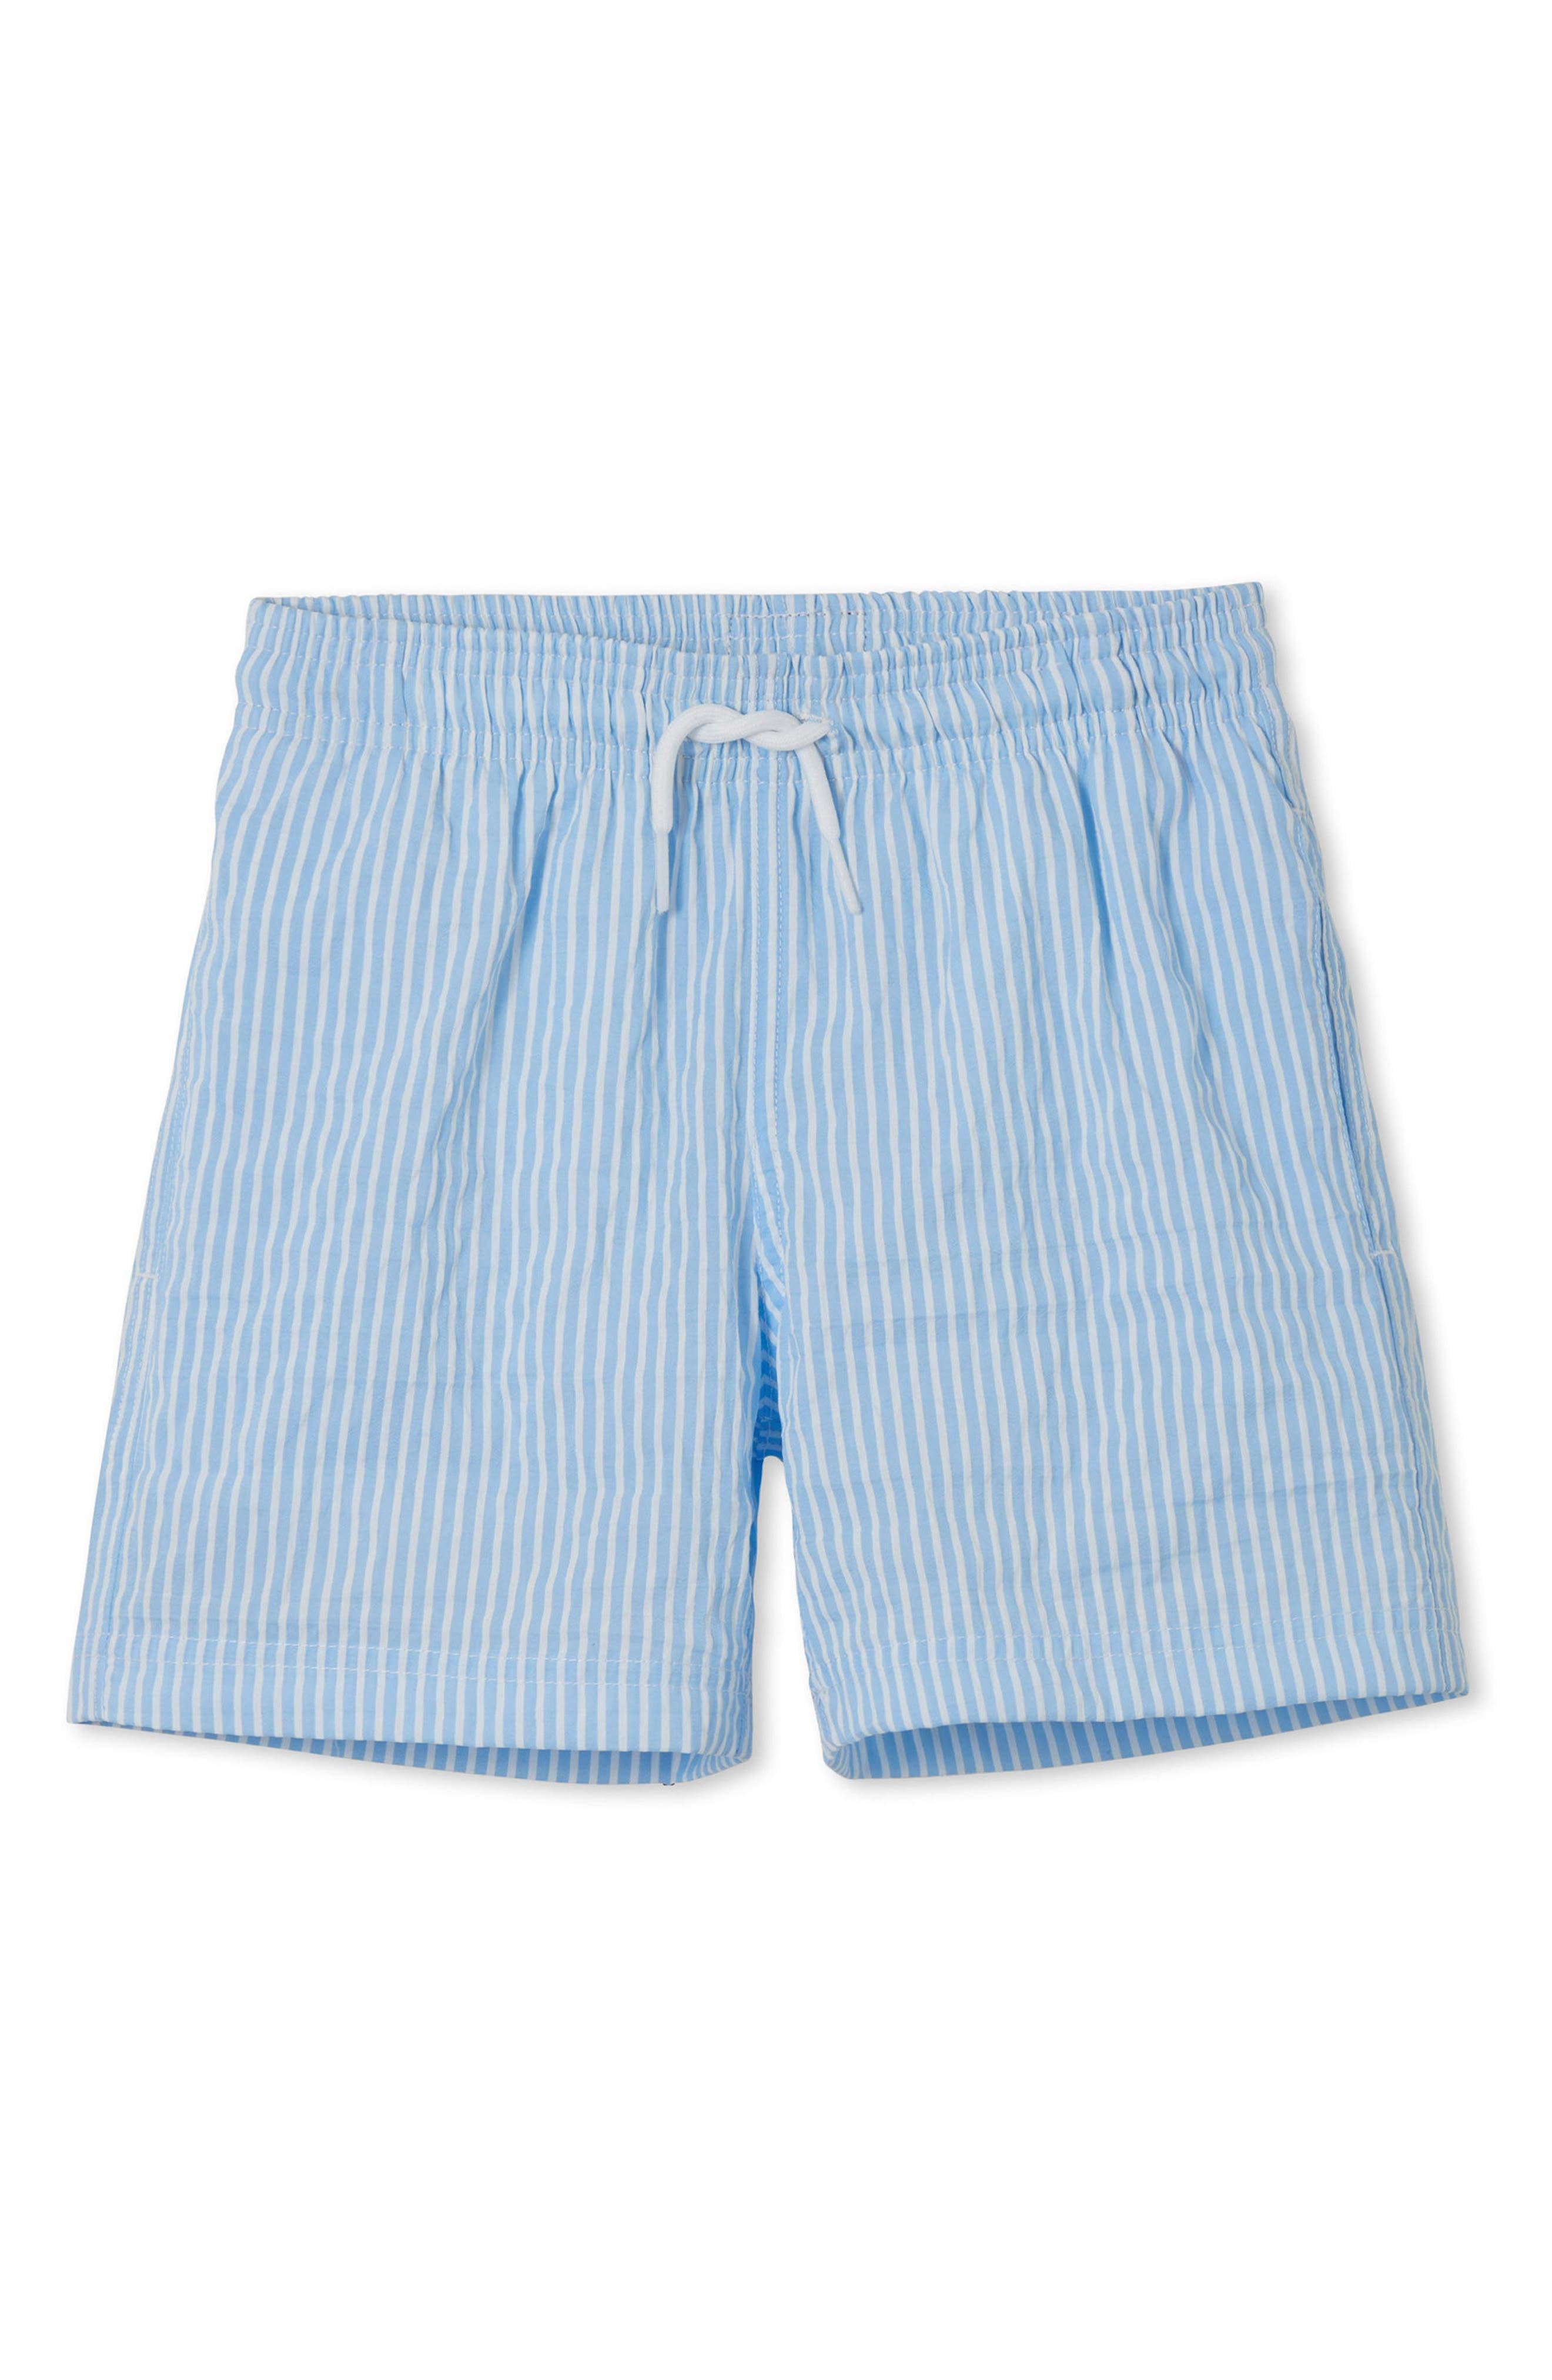 Blue Stripe Swim Trunks,                         Main,                         color, Blue